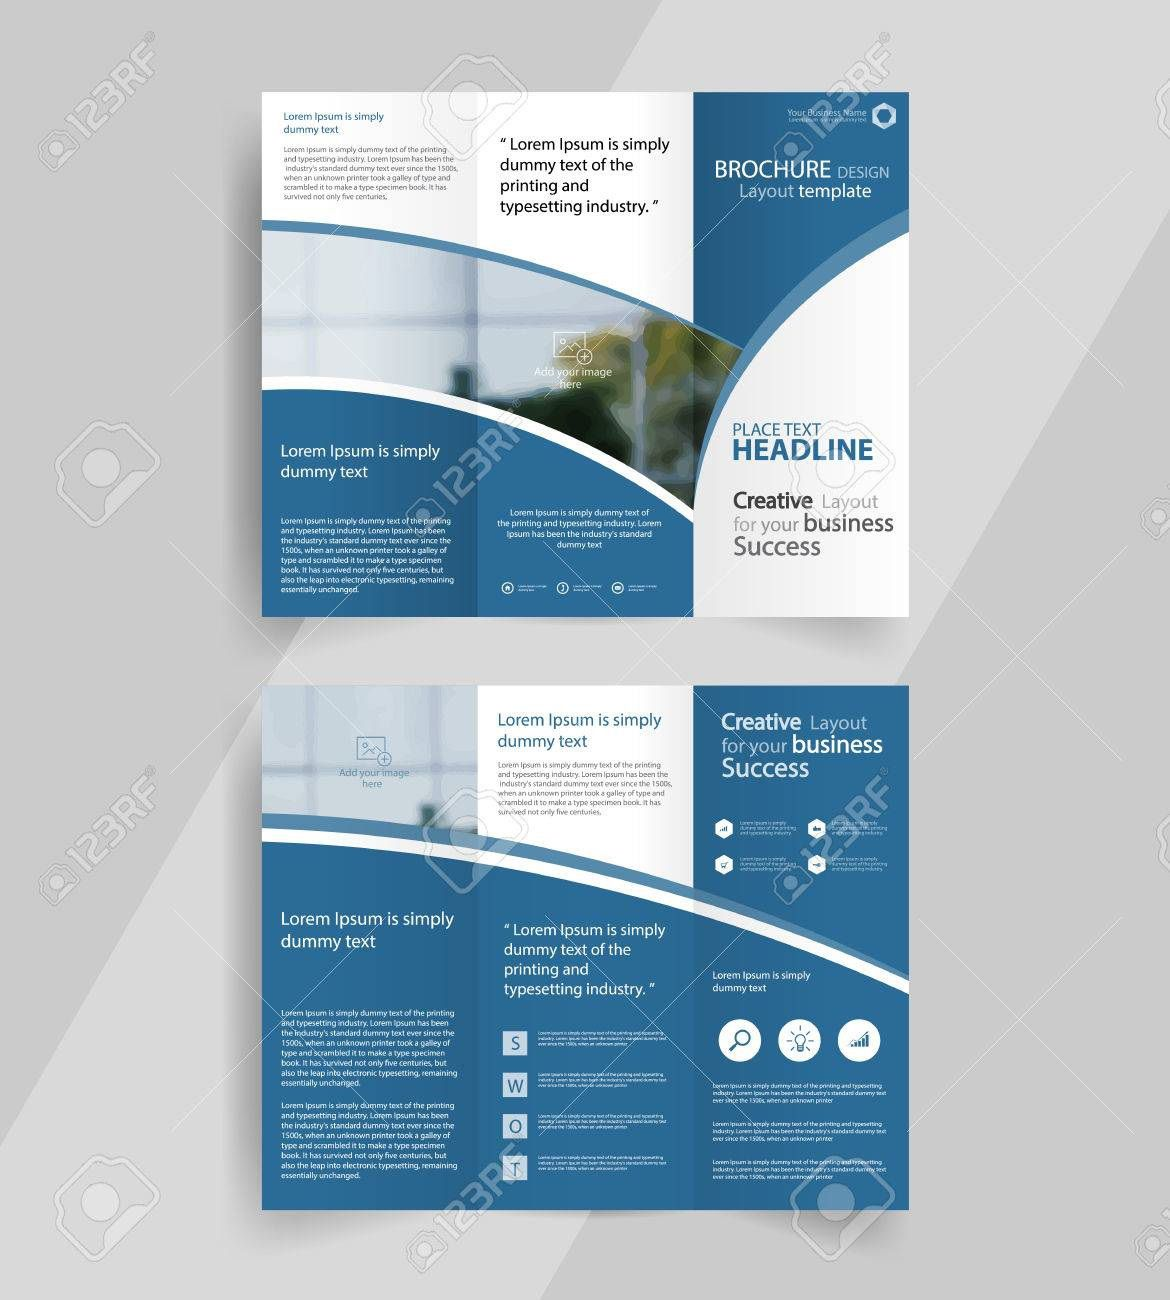 003 Impressive Tri Fold Brochure Template Free Highest Quality  Download Photoshop M Word Tri-fold Indesign MacFull